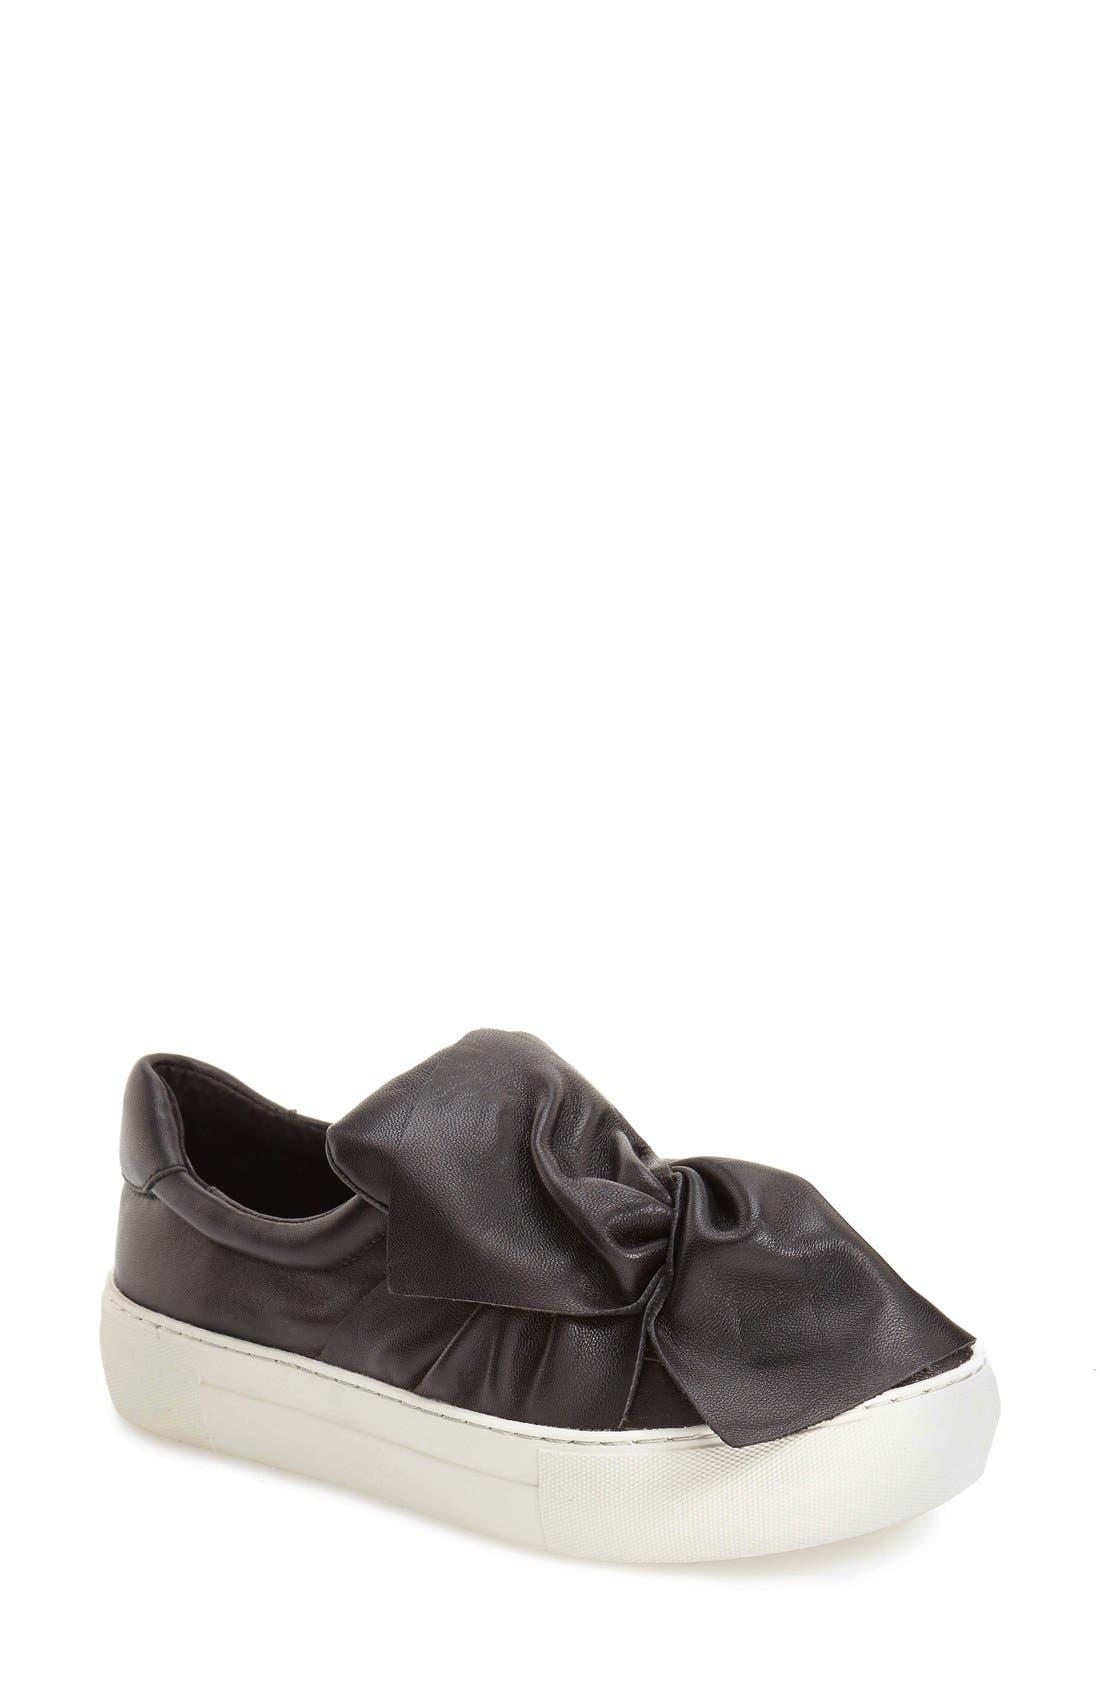 JSlides 'Annabelle' Platform Sneaker (Women)